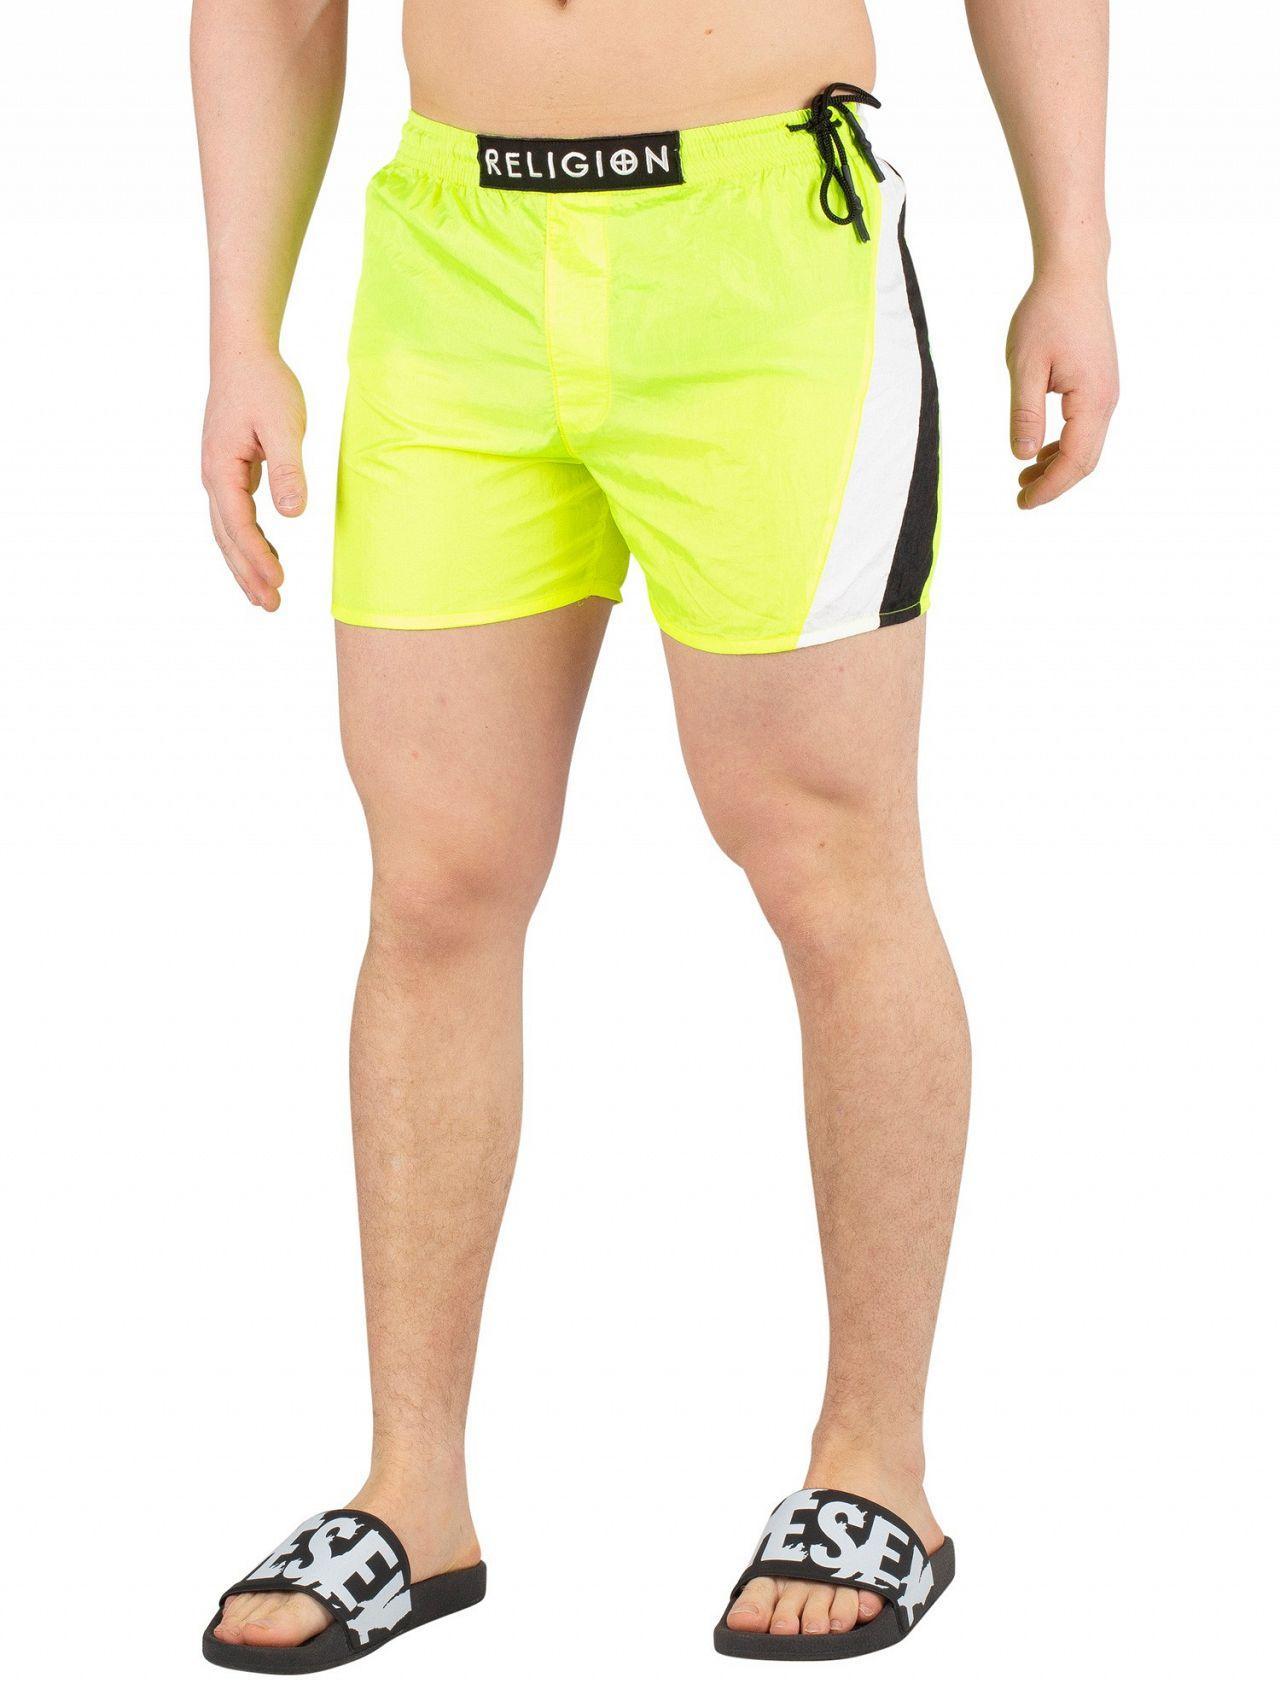 db18204ea1490 ... Swimshorts, Yellow Men's In Yellow for Men - Lyst. View fullscreen